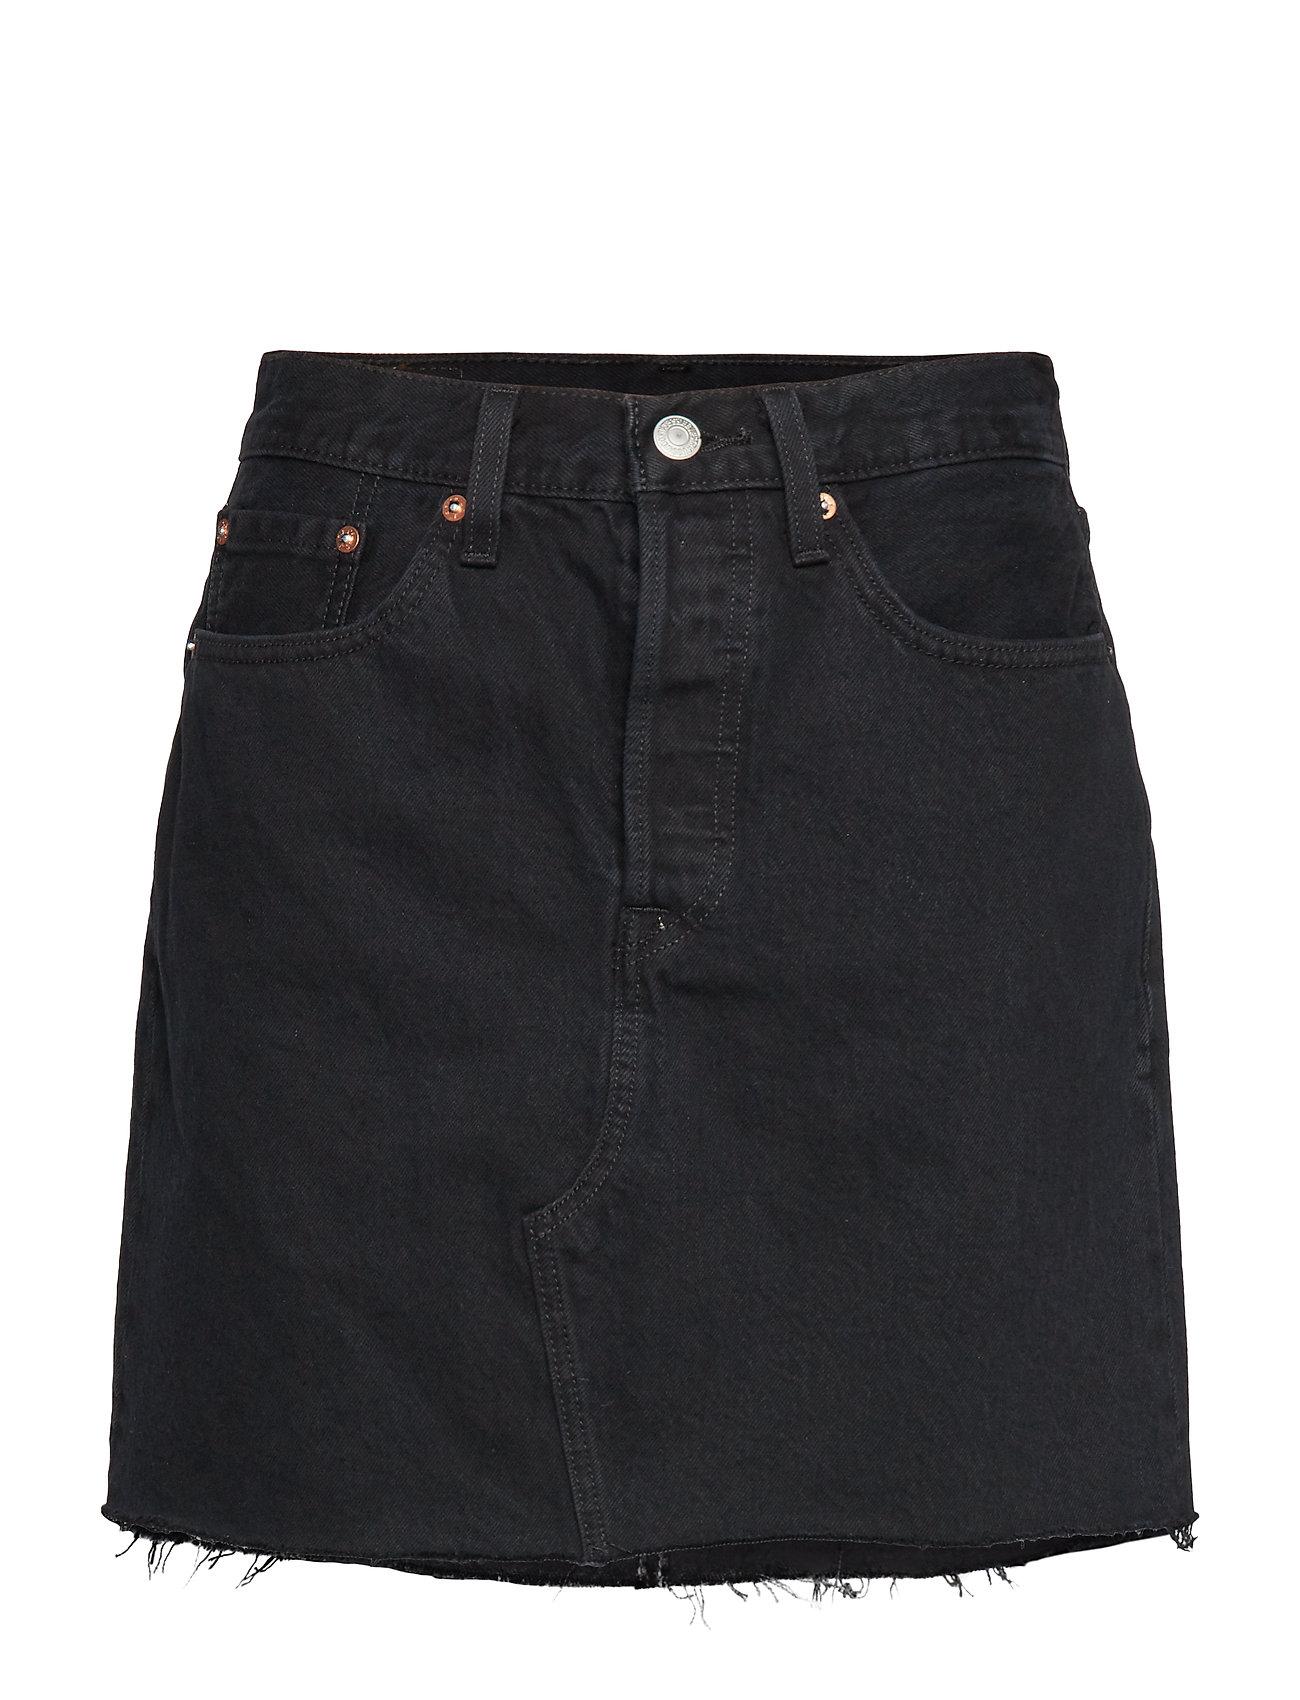 Skirt Women Hr Bf Iconic Decon LeftblacksLevi´s OkP8nN0wX